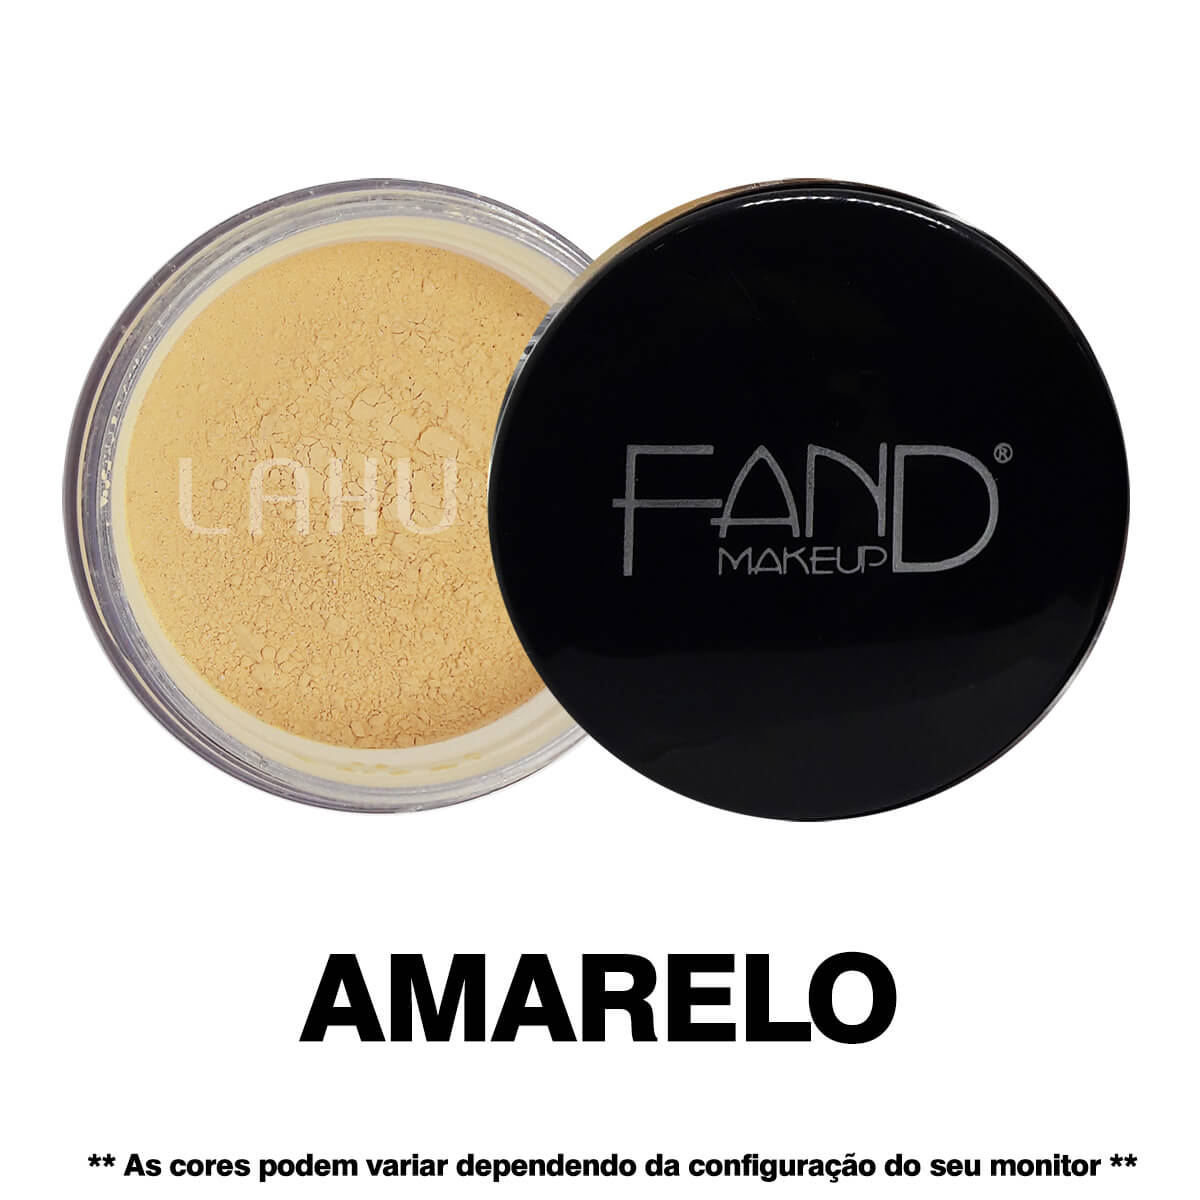 Pó Facial Solto Amarelo 01 Fand Makeup